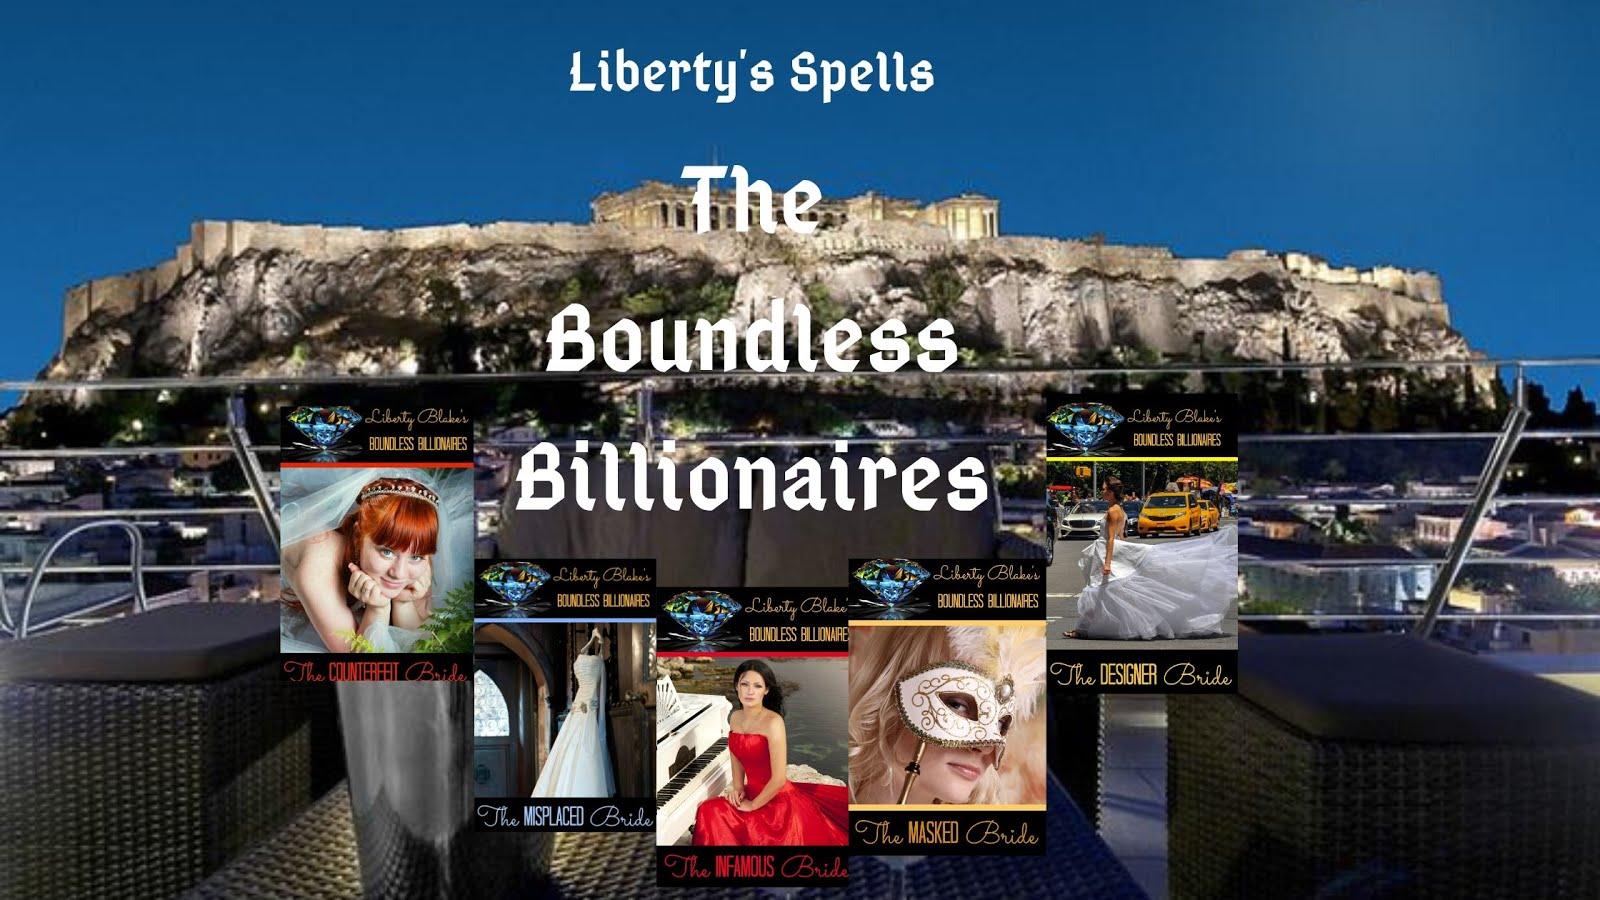 Liberty's Spells